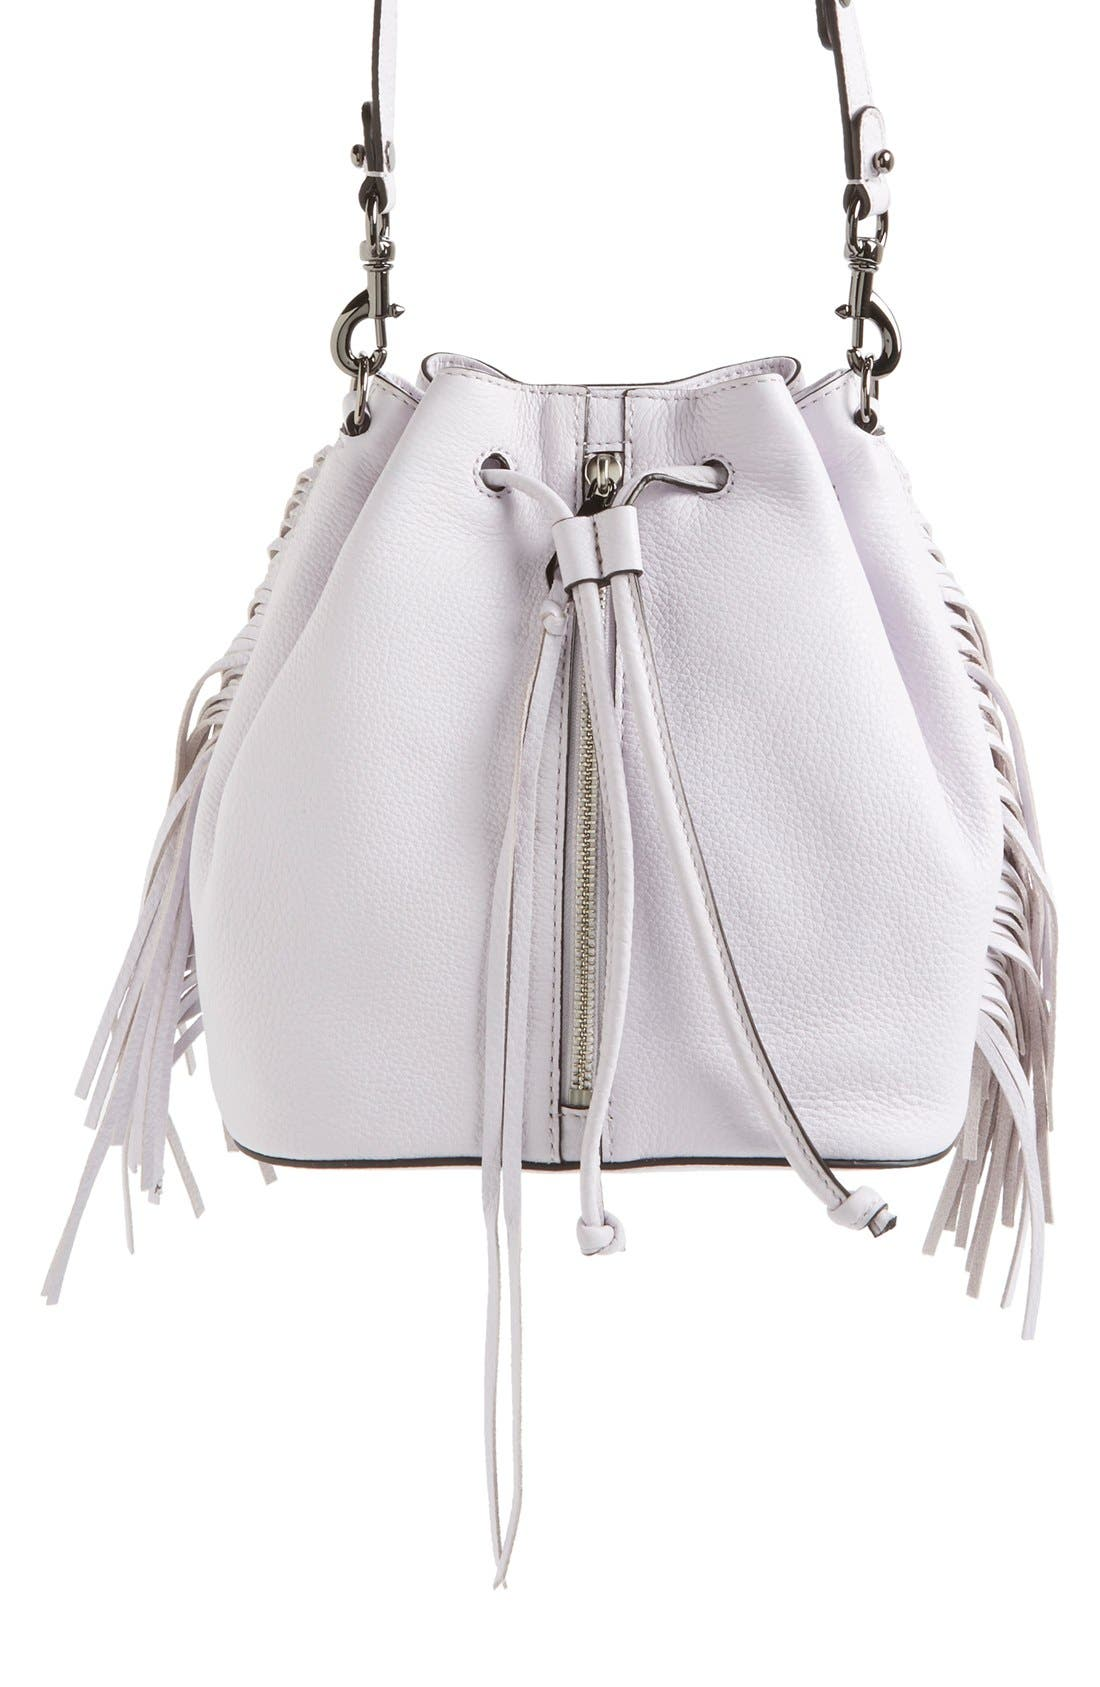 Main Image - Rebecca Minkoff 'Mini Fringe Moto' Bucket Bag (Nordstrom Exclusive)